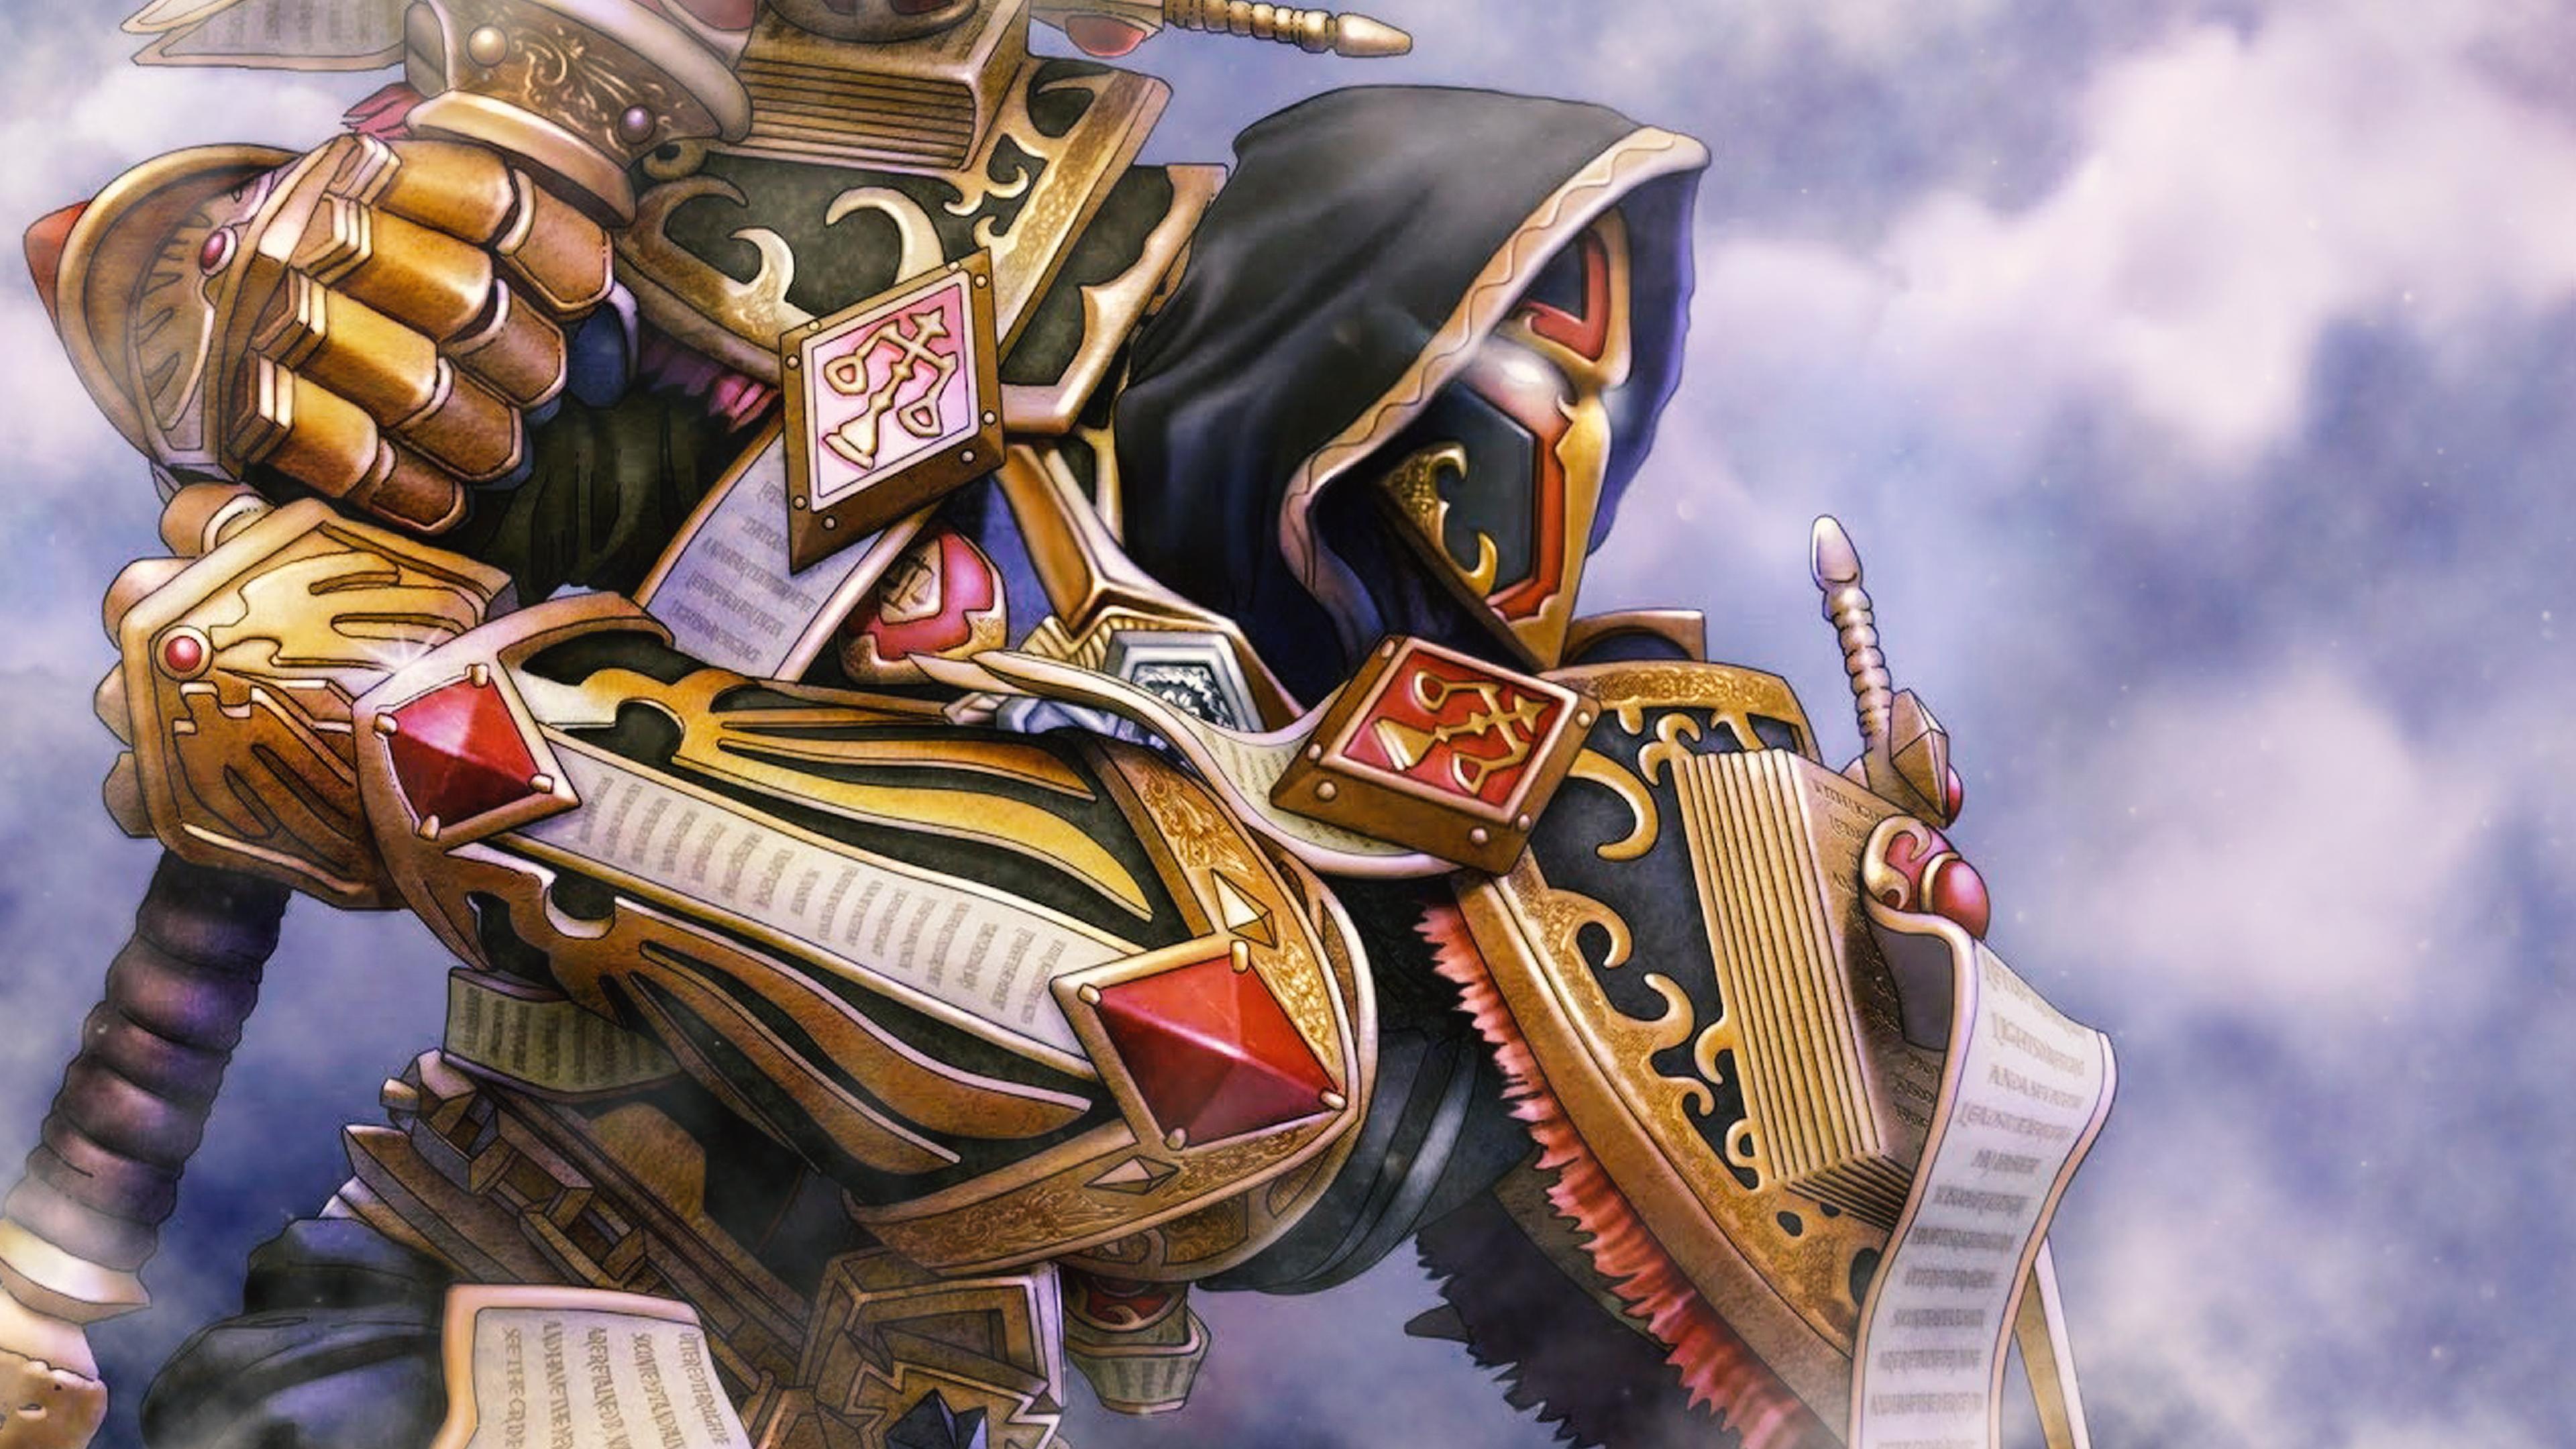 Classic Wow Paladin Wallpaper Collection Warcraft Art Paladin World Of Warcraft